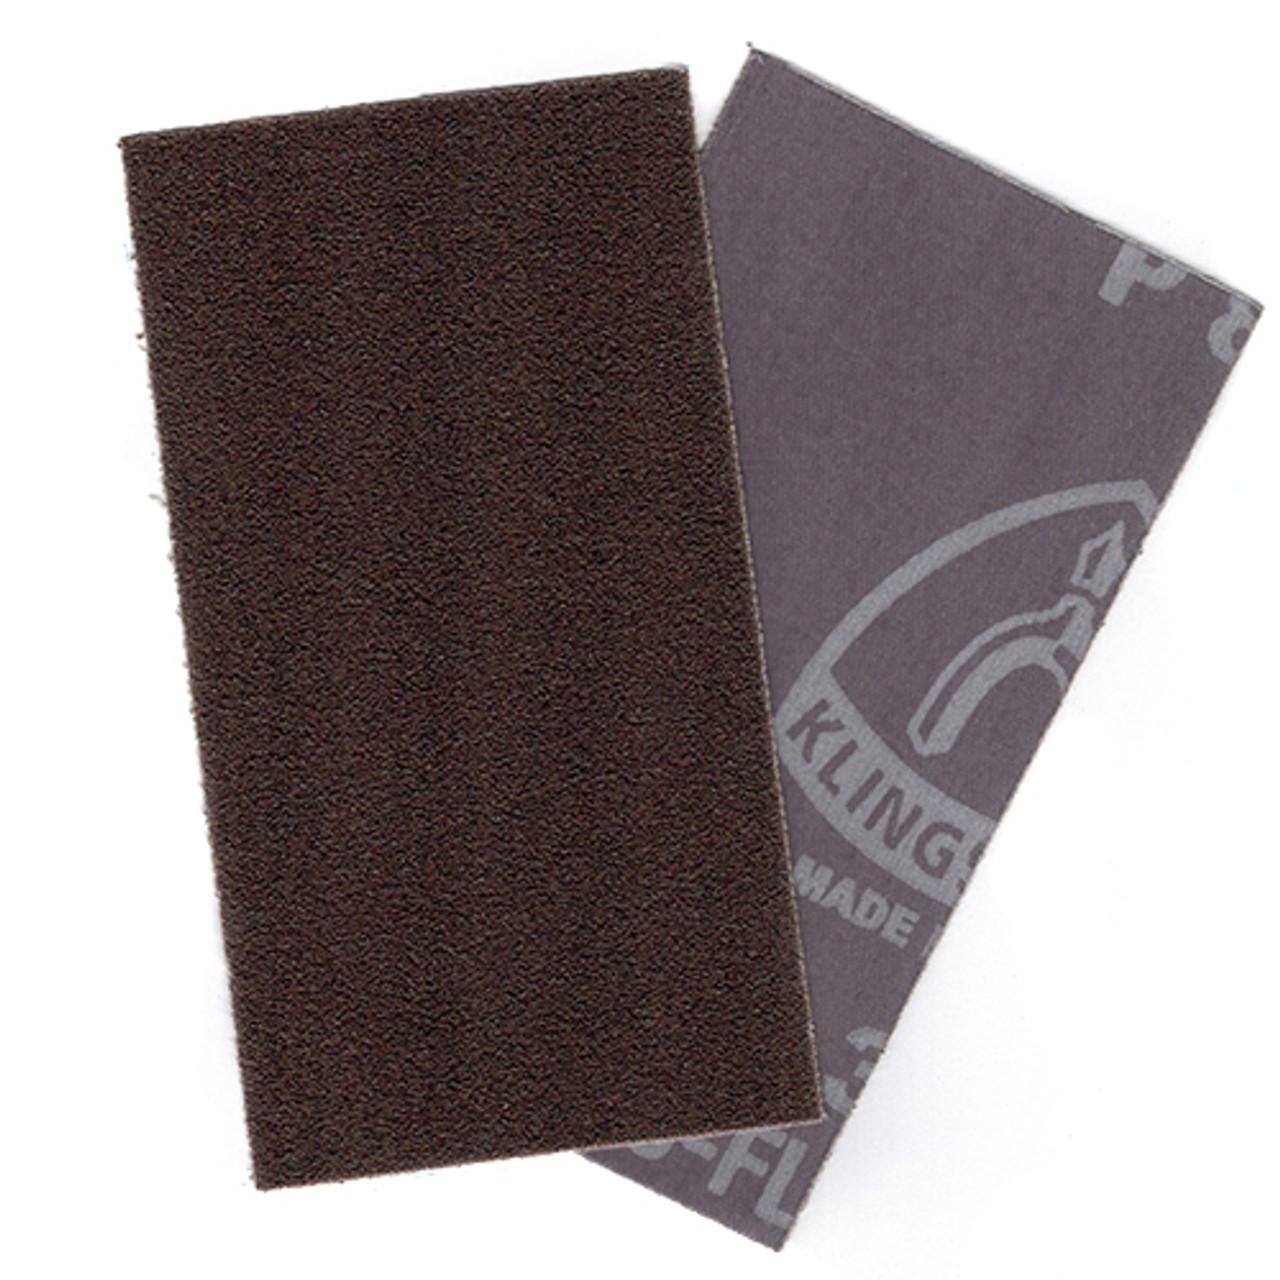 "Soft-Sanders 5"" Foam Profile Sanders, Adhesive Backed Abrasive Sheets 220 Grit 10pk"